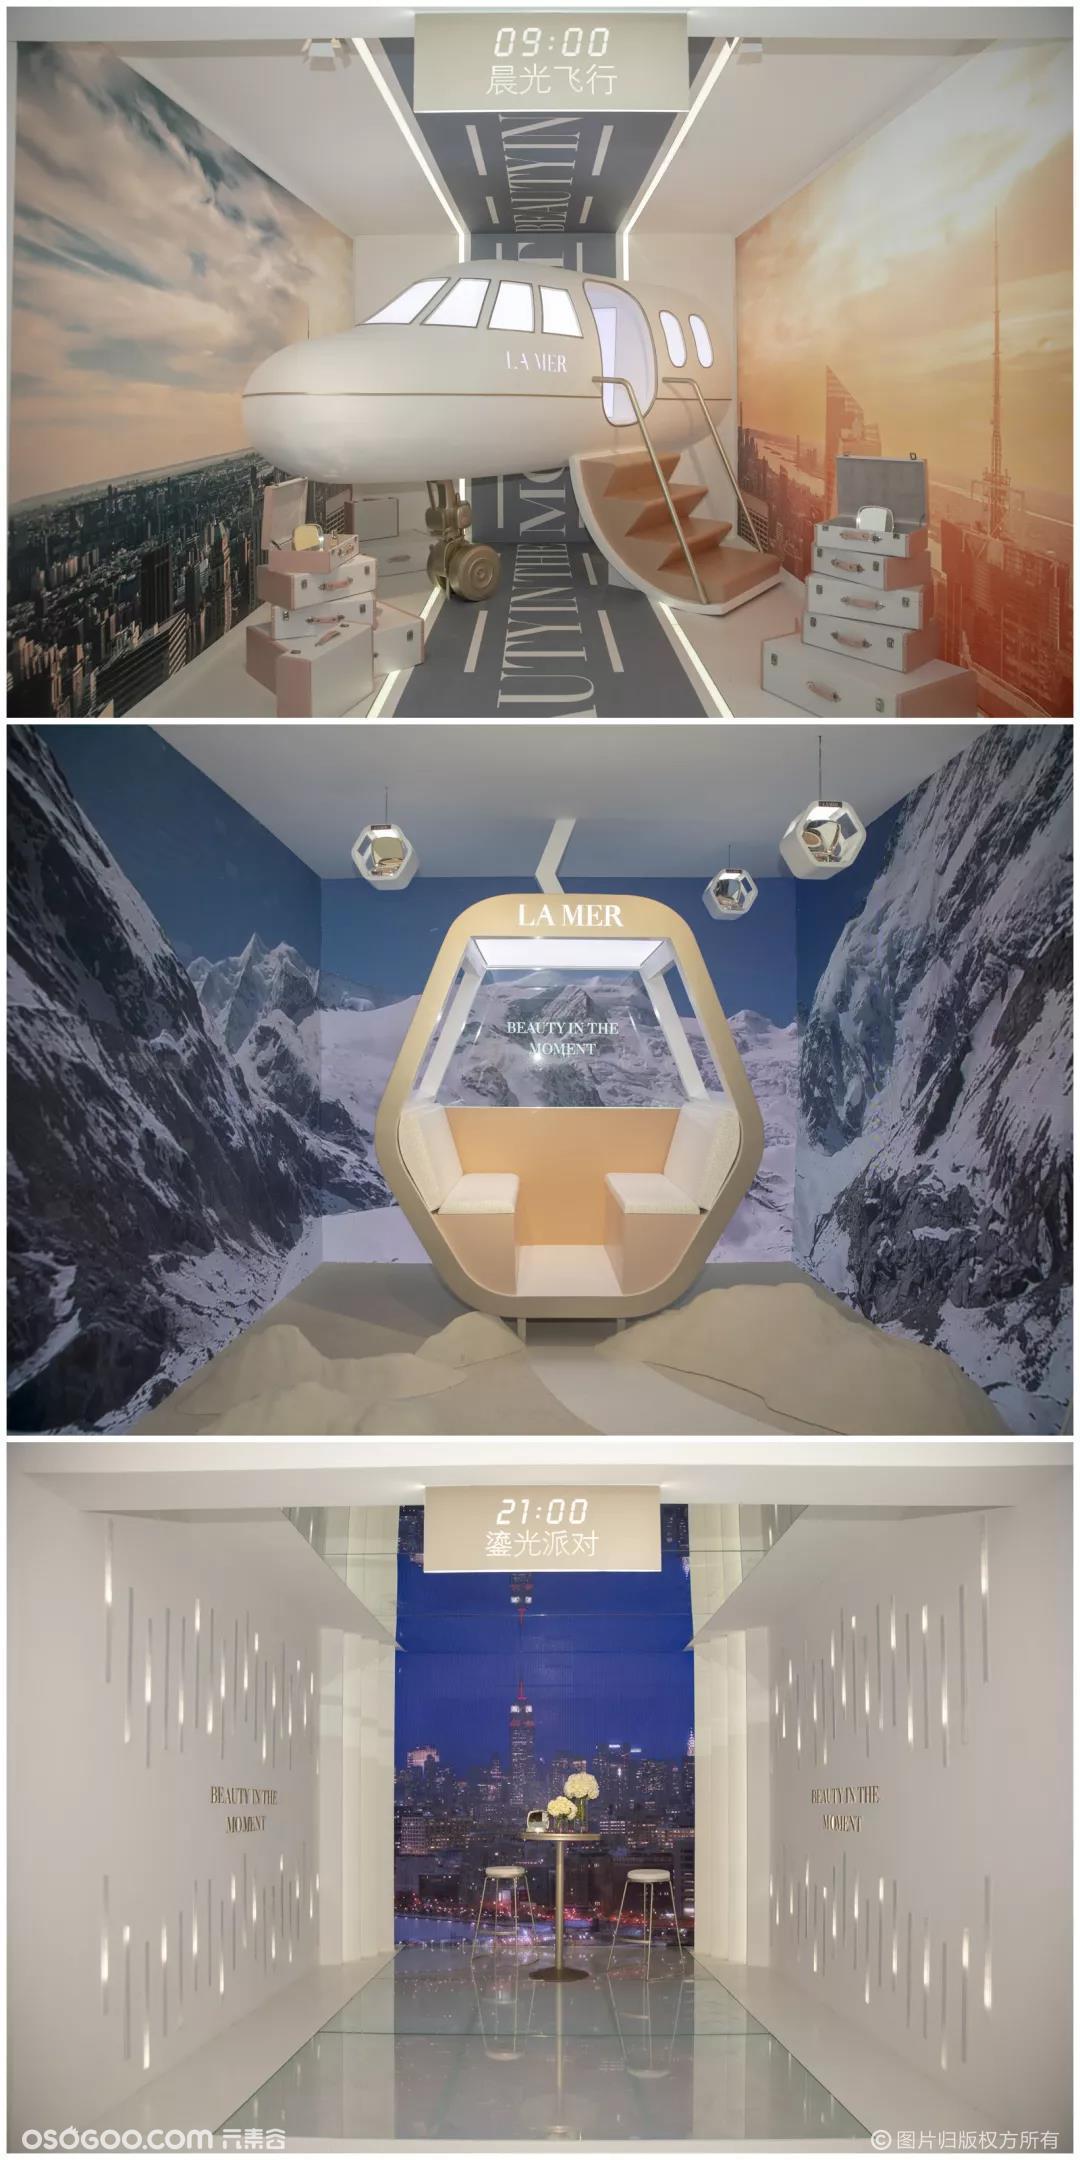 "LA MER鎏光空间"" 限时体验展览"